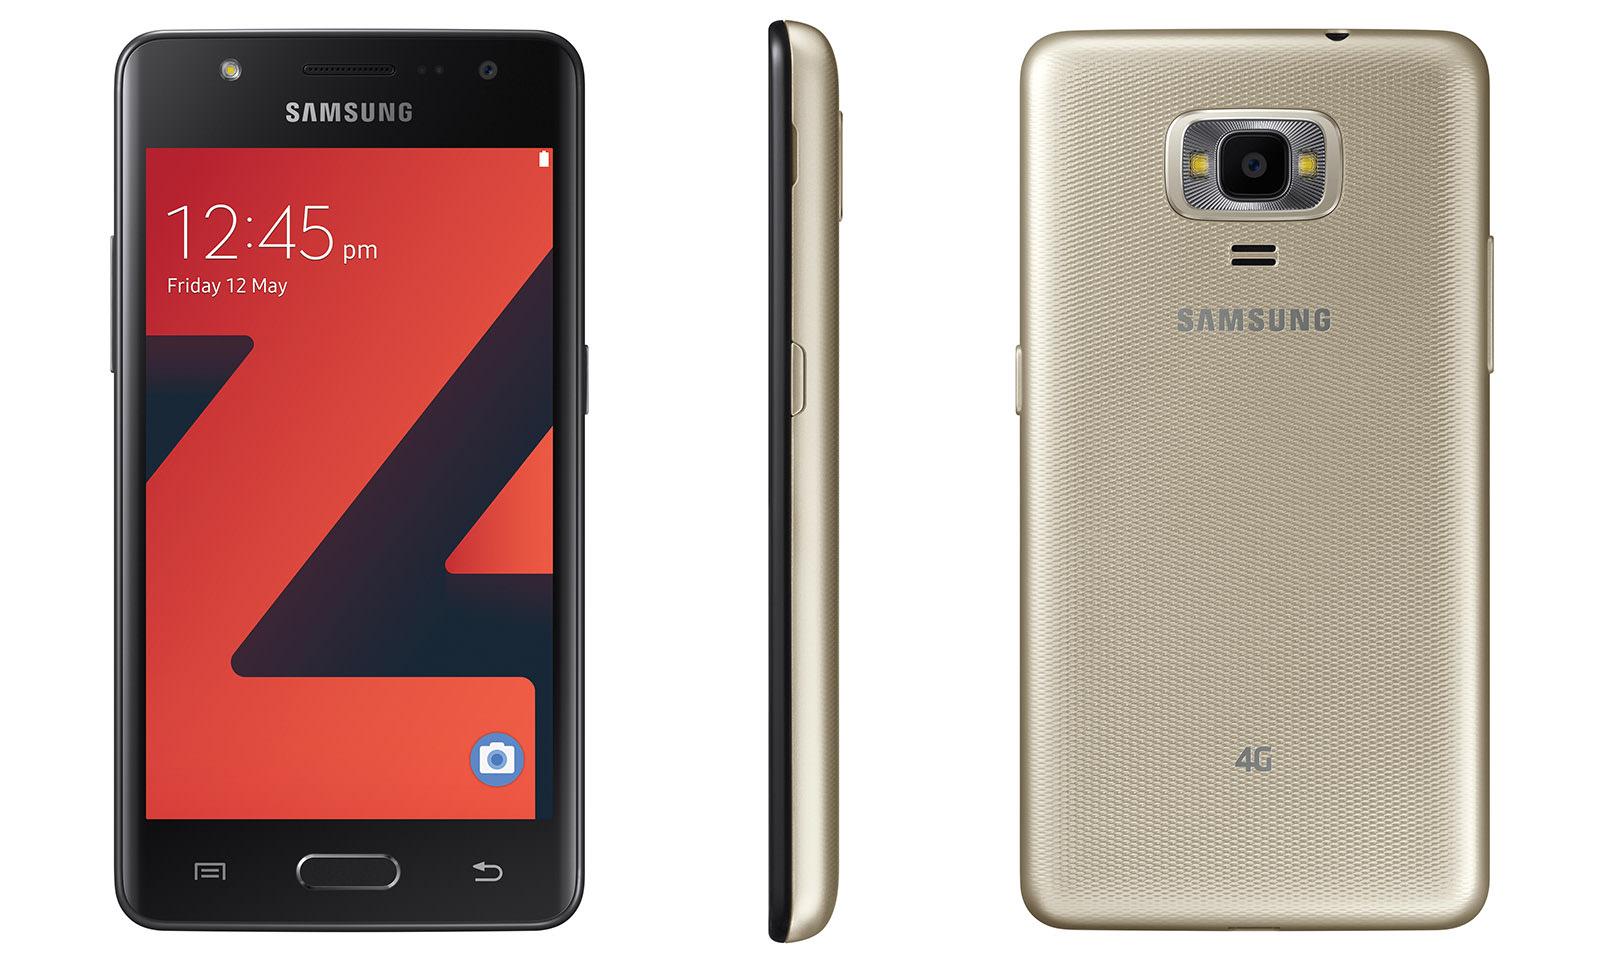 Samsung promises Tizen phones aren't dead with the budget Z4